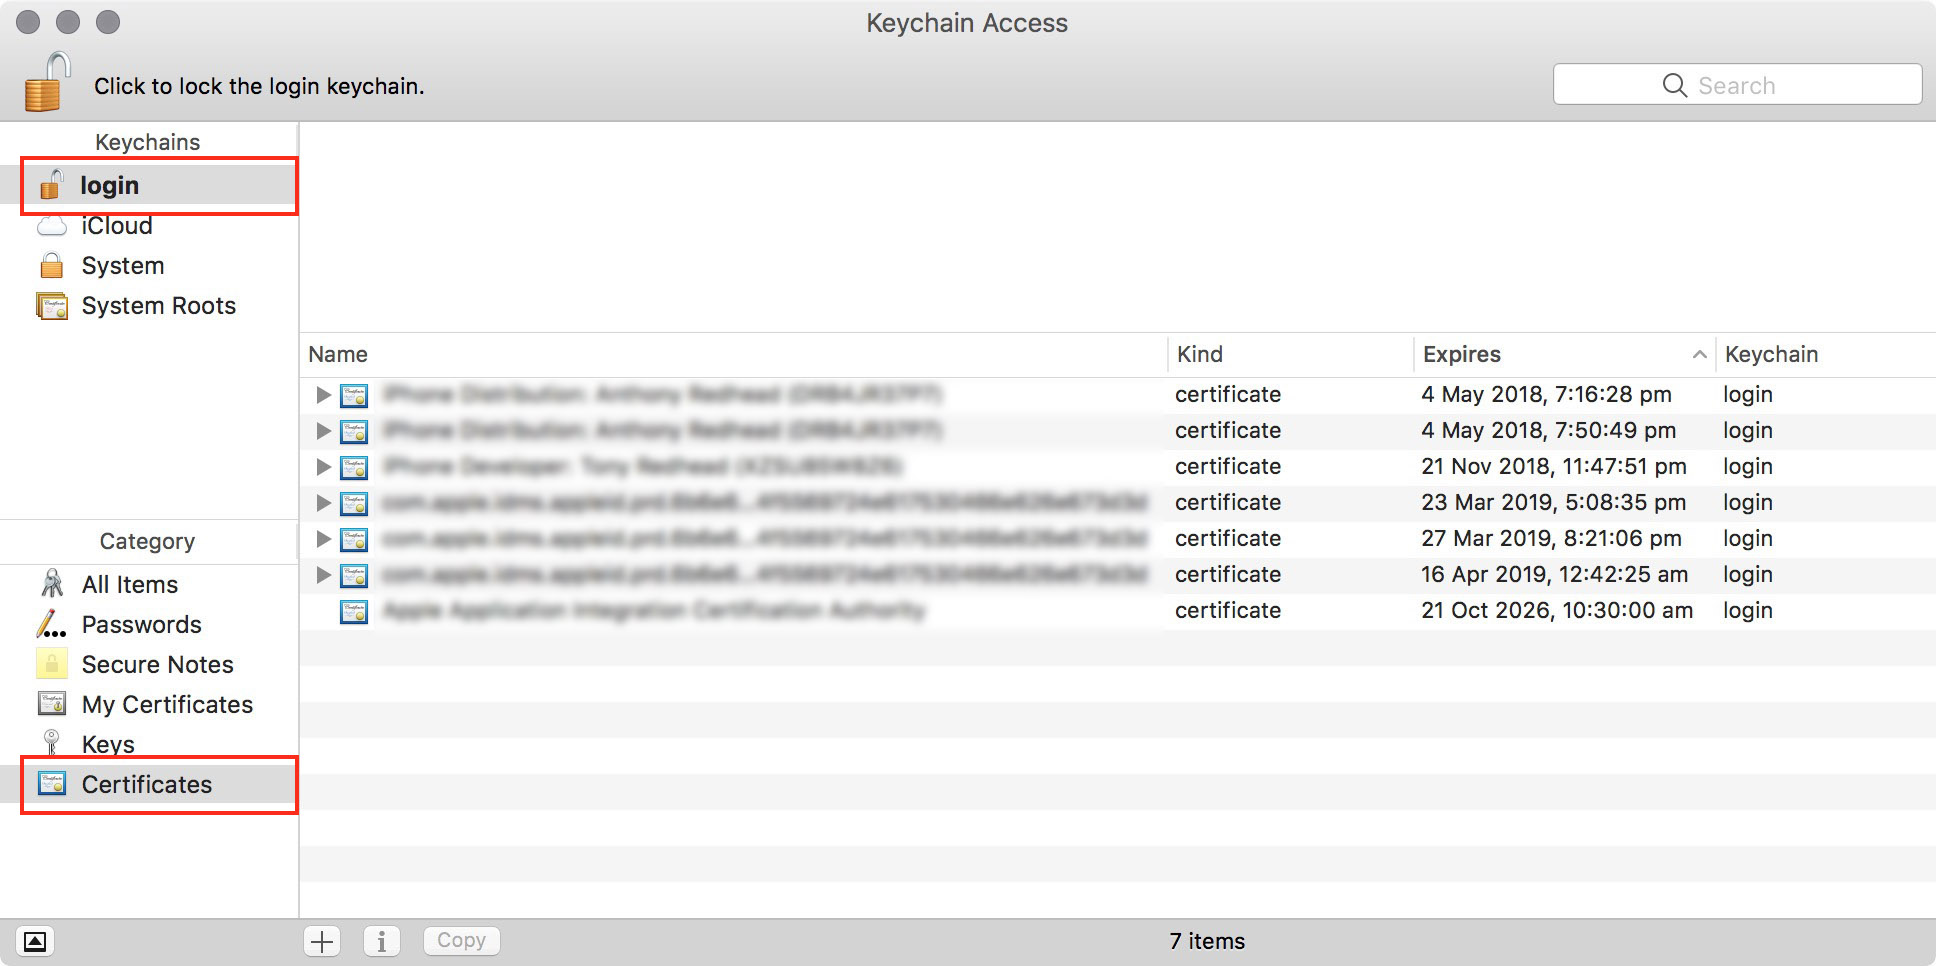 figure #8: Keychain Application